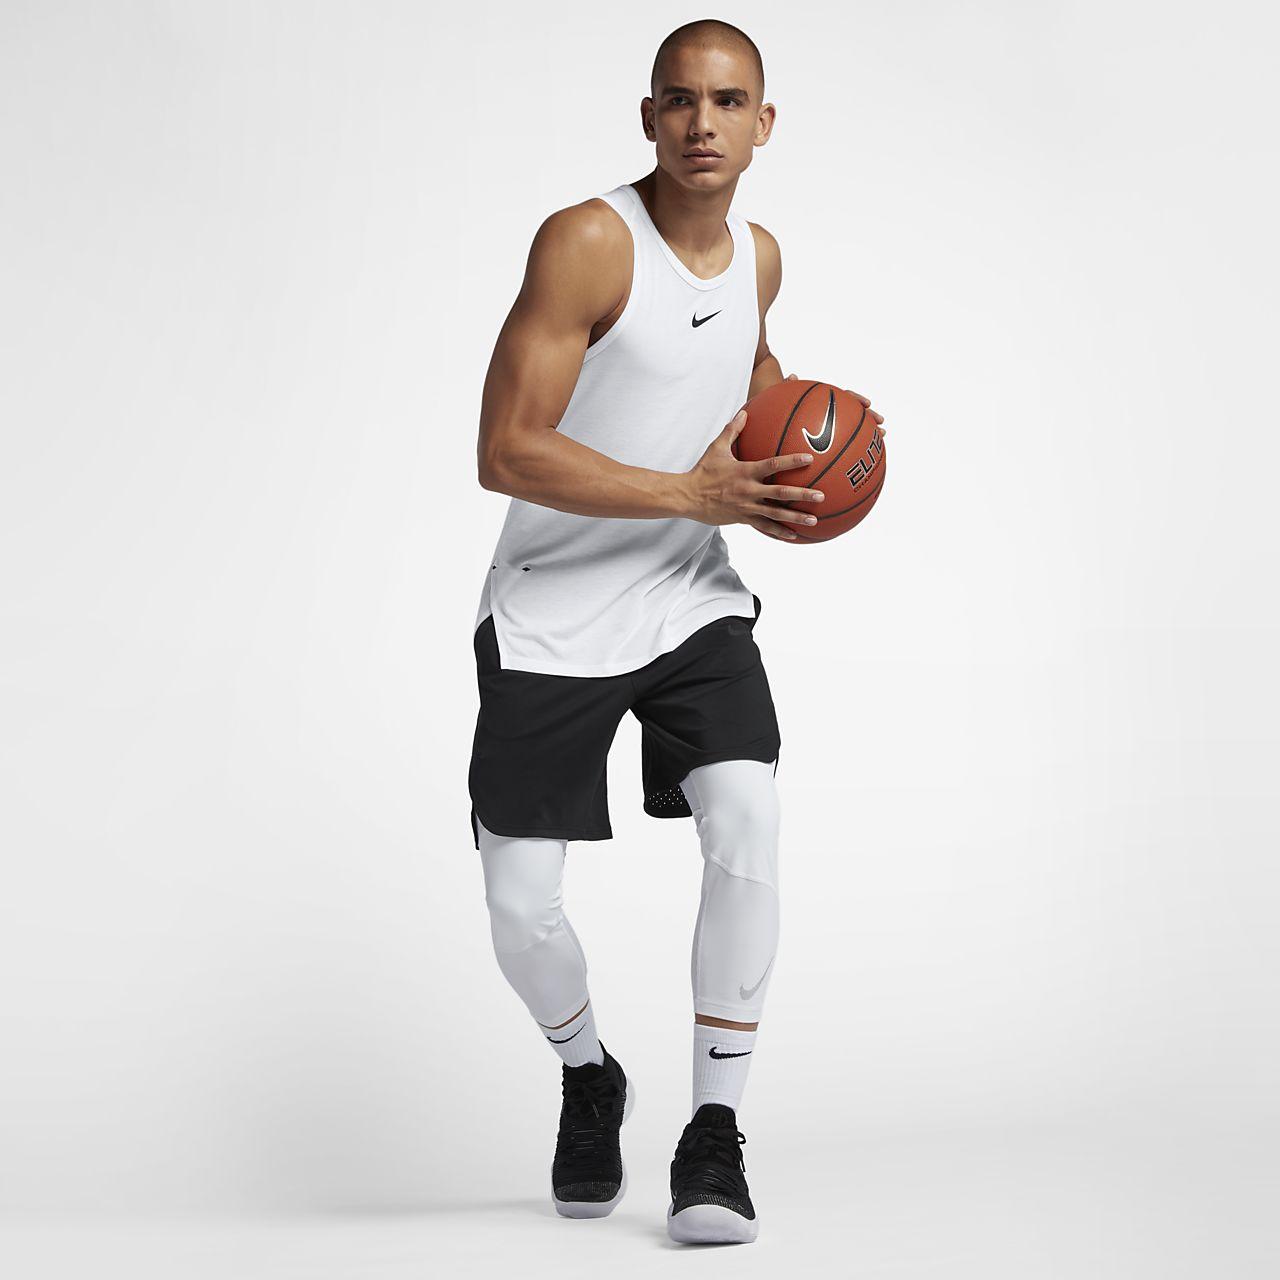 743c1c638fc2c Nike Breathe Elite Men s Sleeveless Basketball Top. Nike.com CH